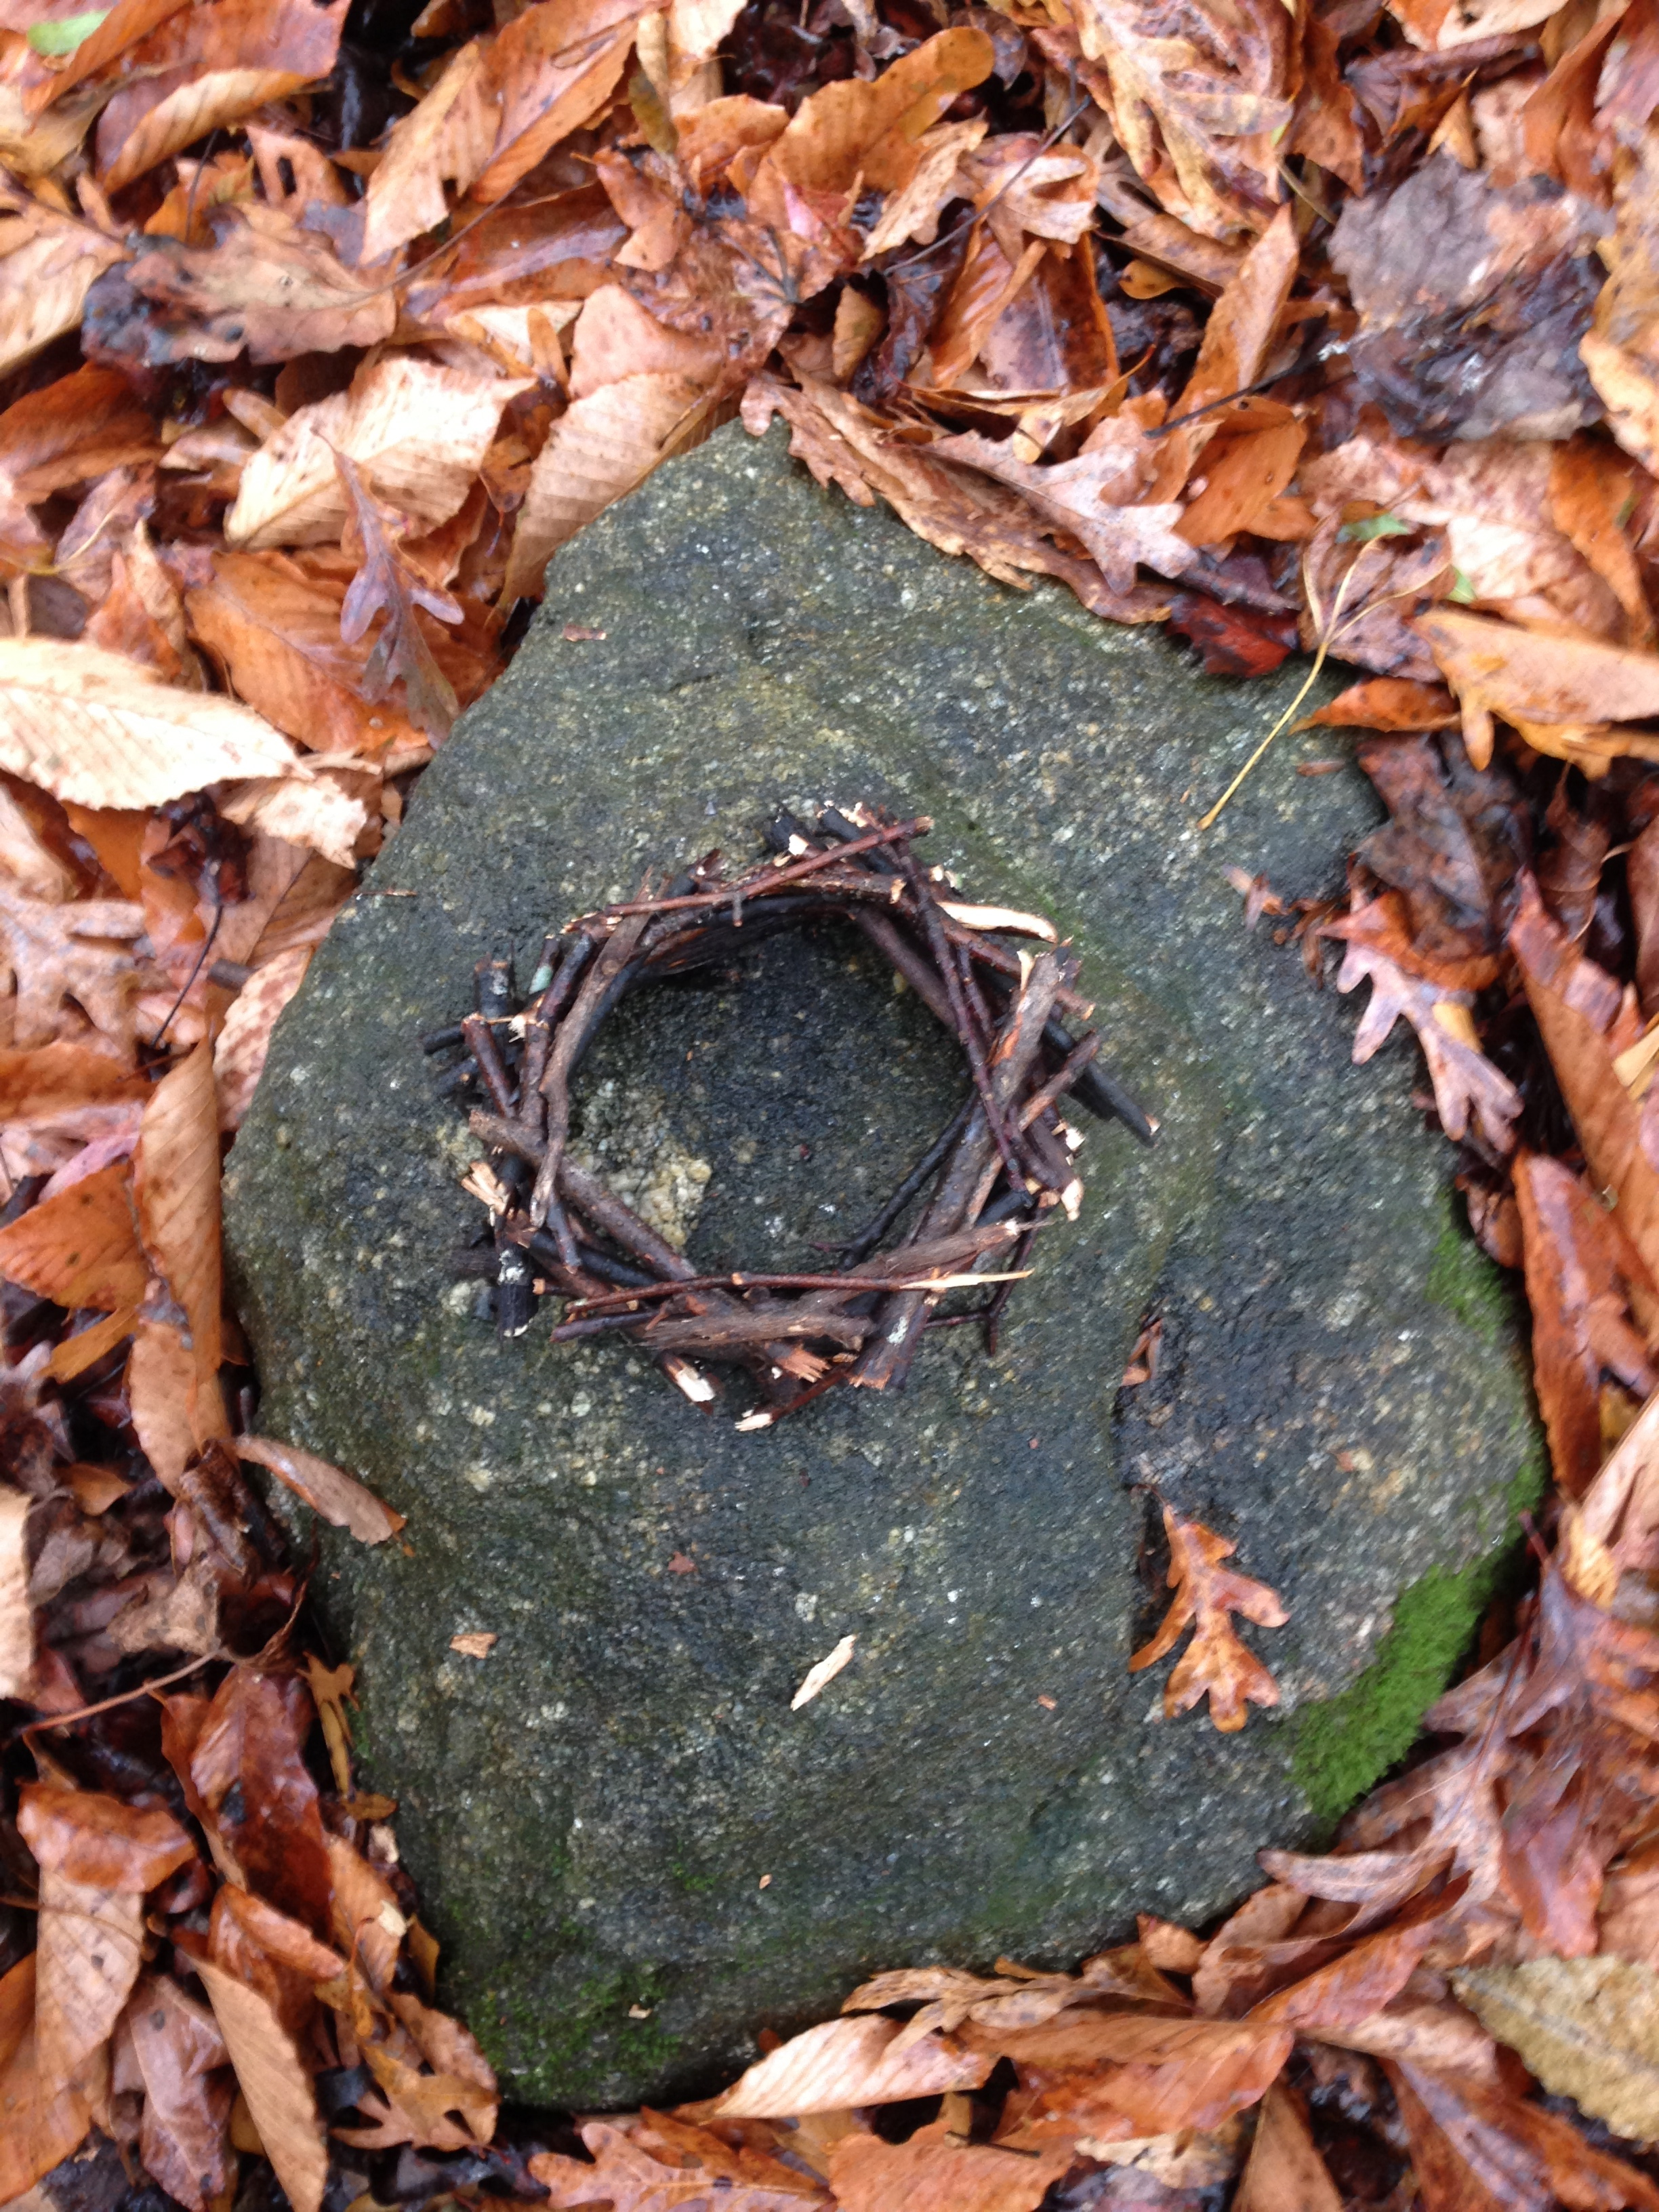 Nest on stone. Birchmore Trail. Athens, GA. Fall 2013.